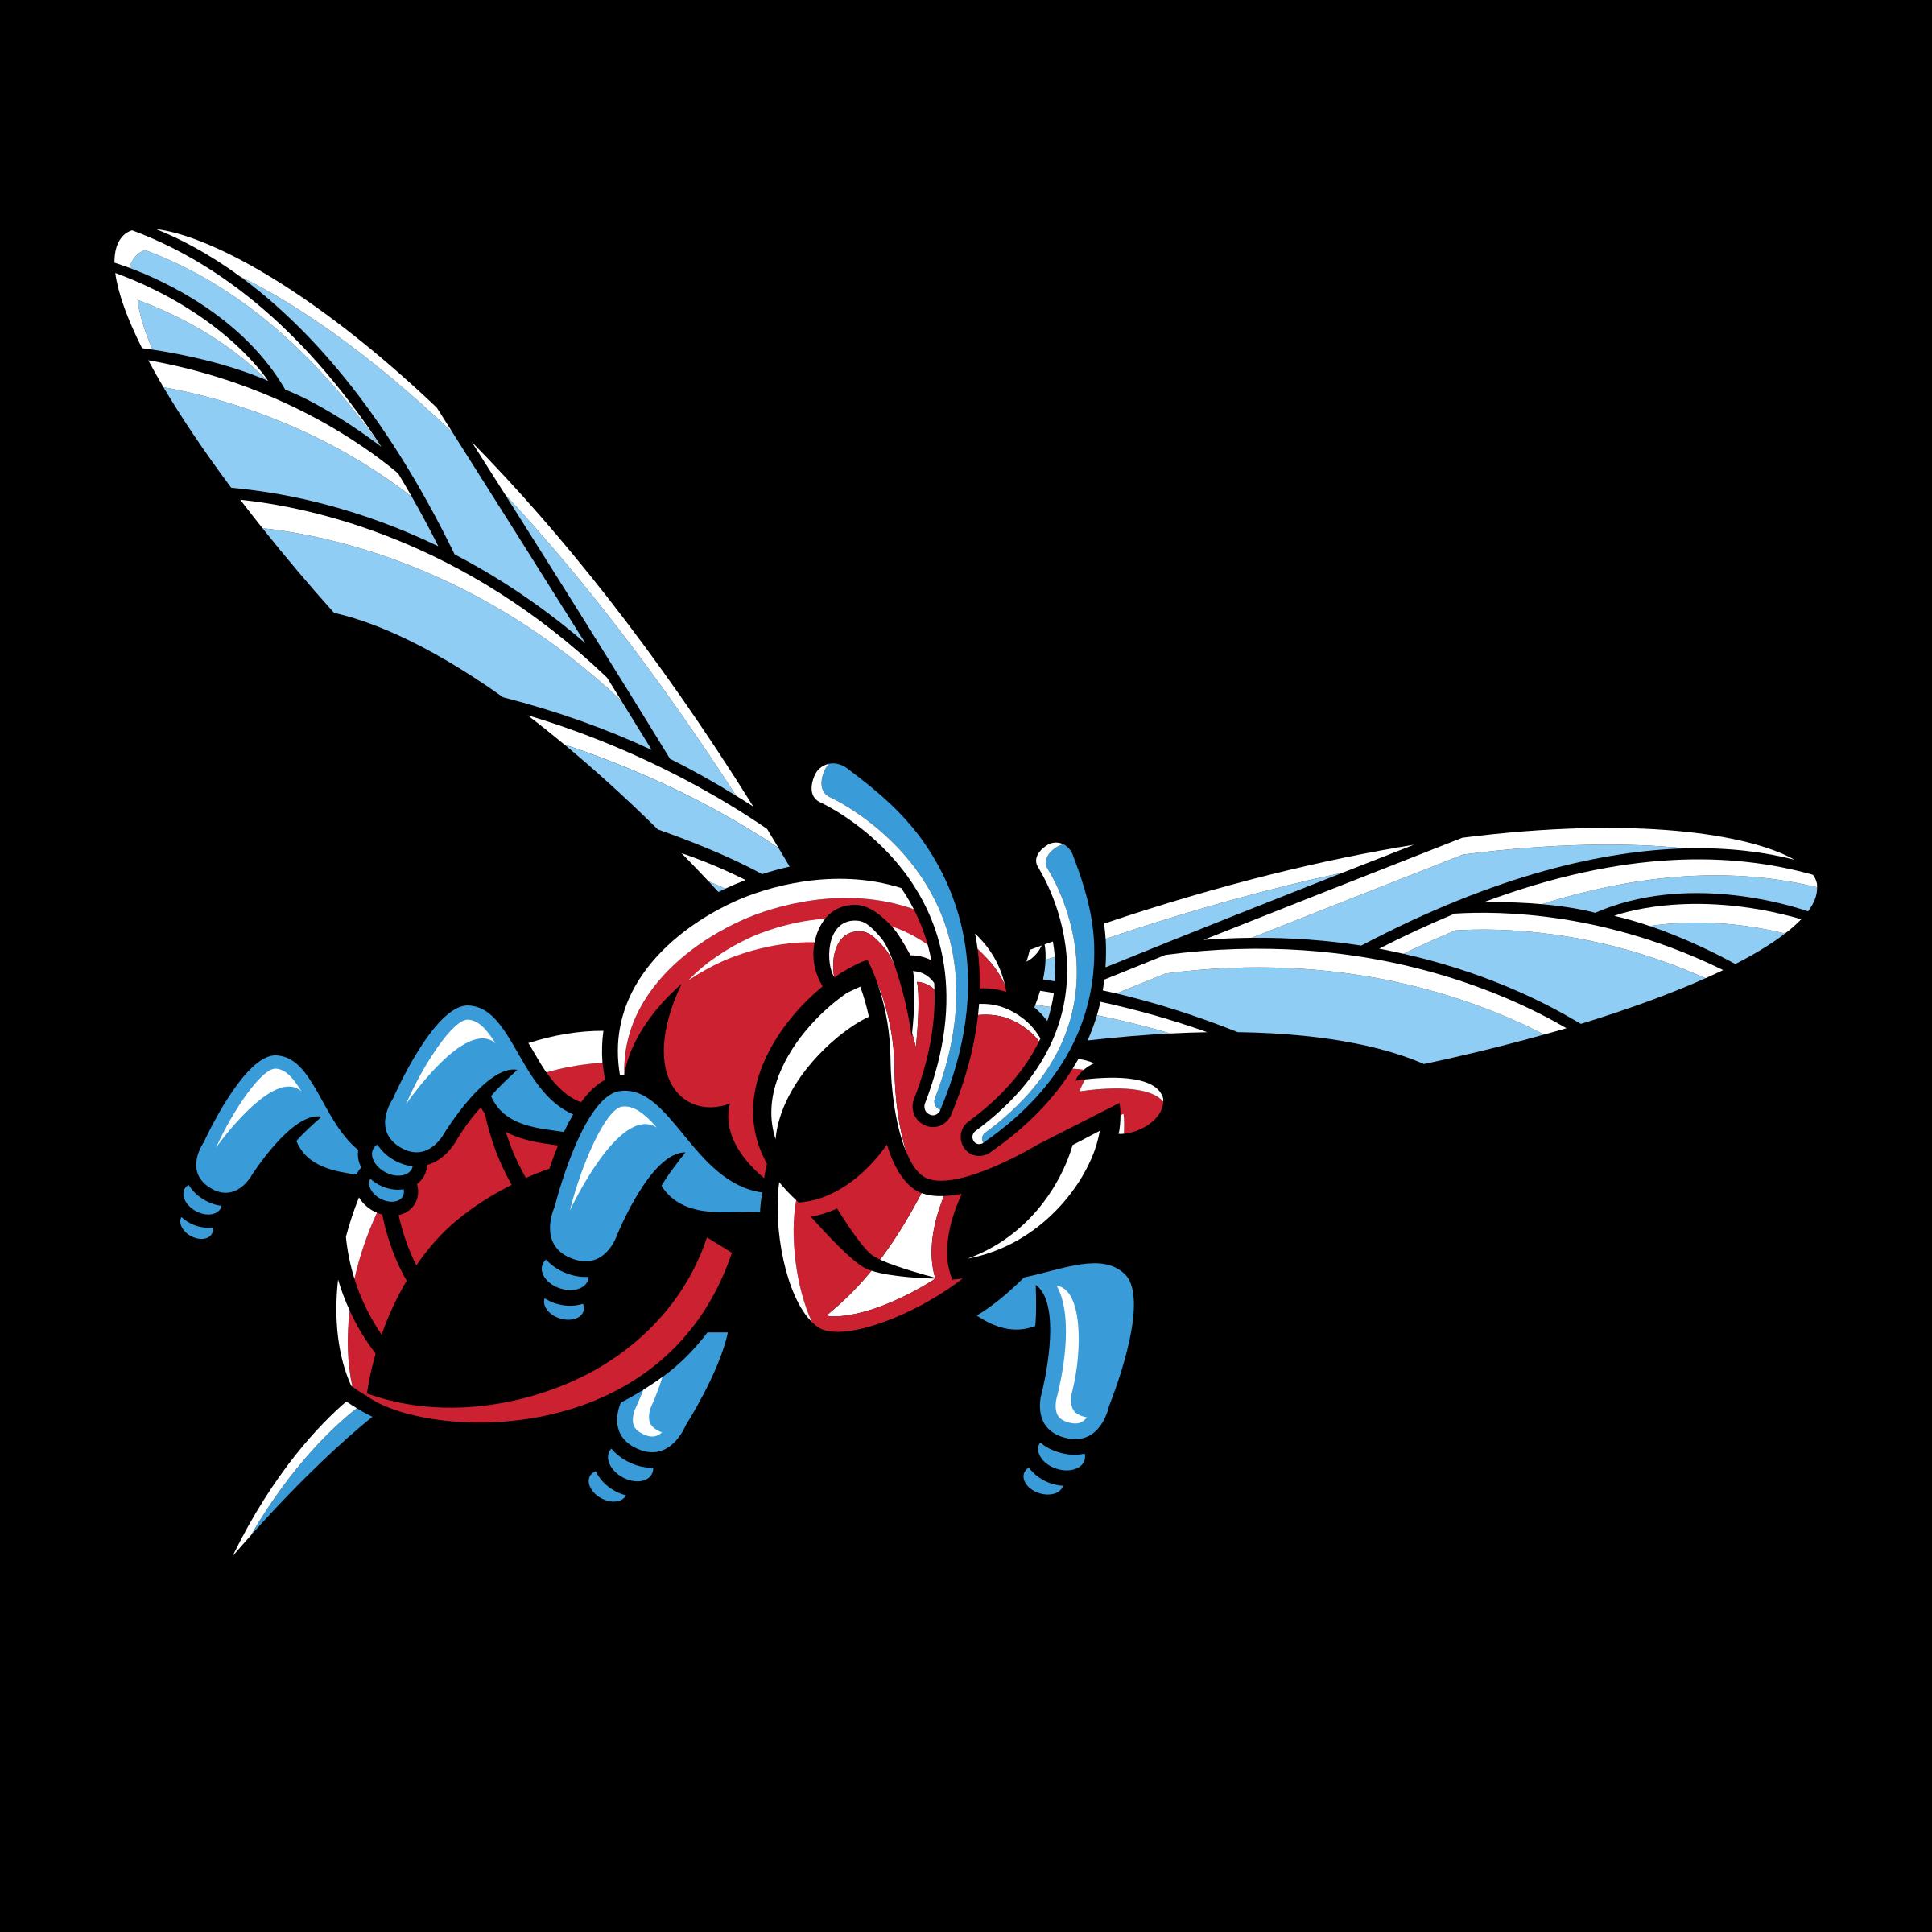 image transparent library Delaware state hornets logo. Hornet vector wing